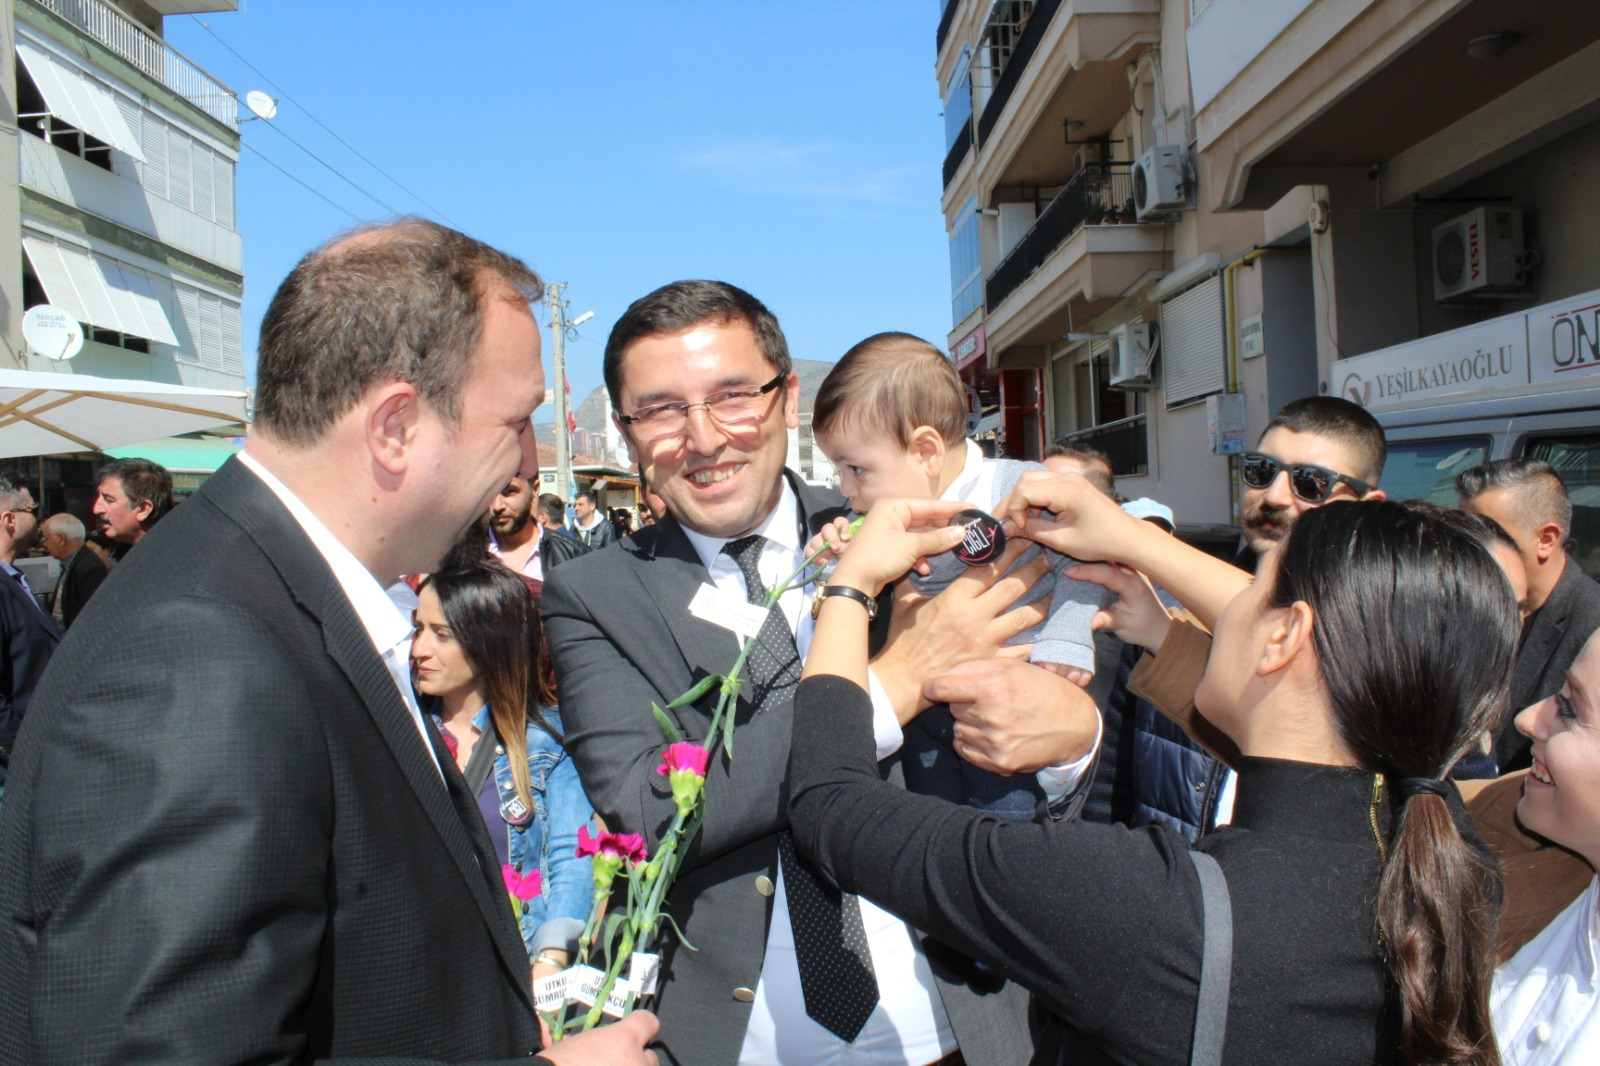 CHP ÇİĞLİ ÖRGÜTÜ TAM KADRO SAHADA